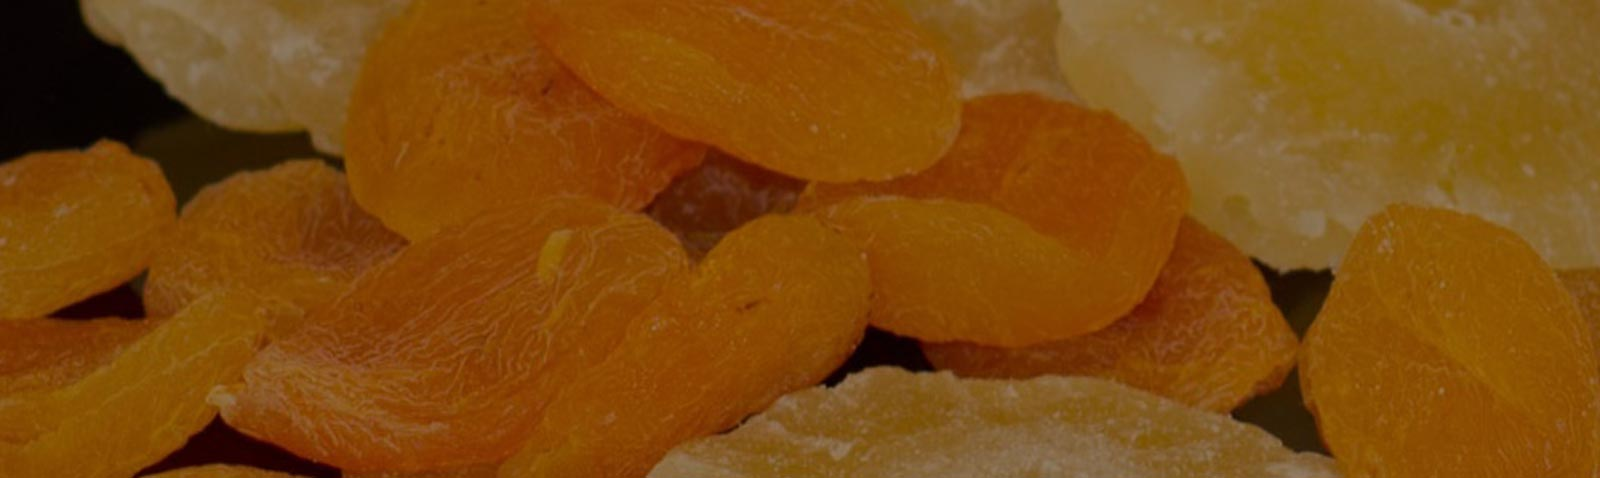 Getrocknete Aprikosen Abbildung